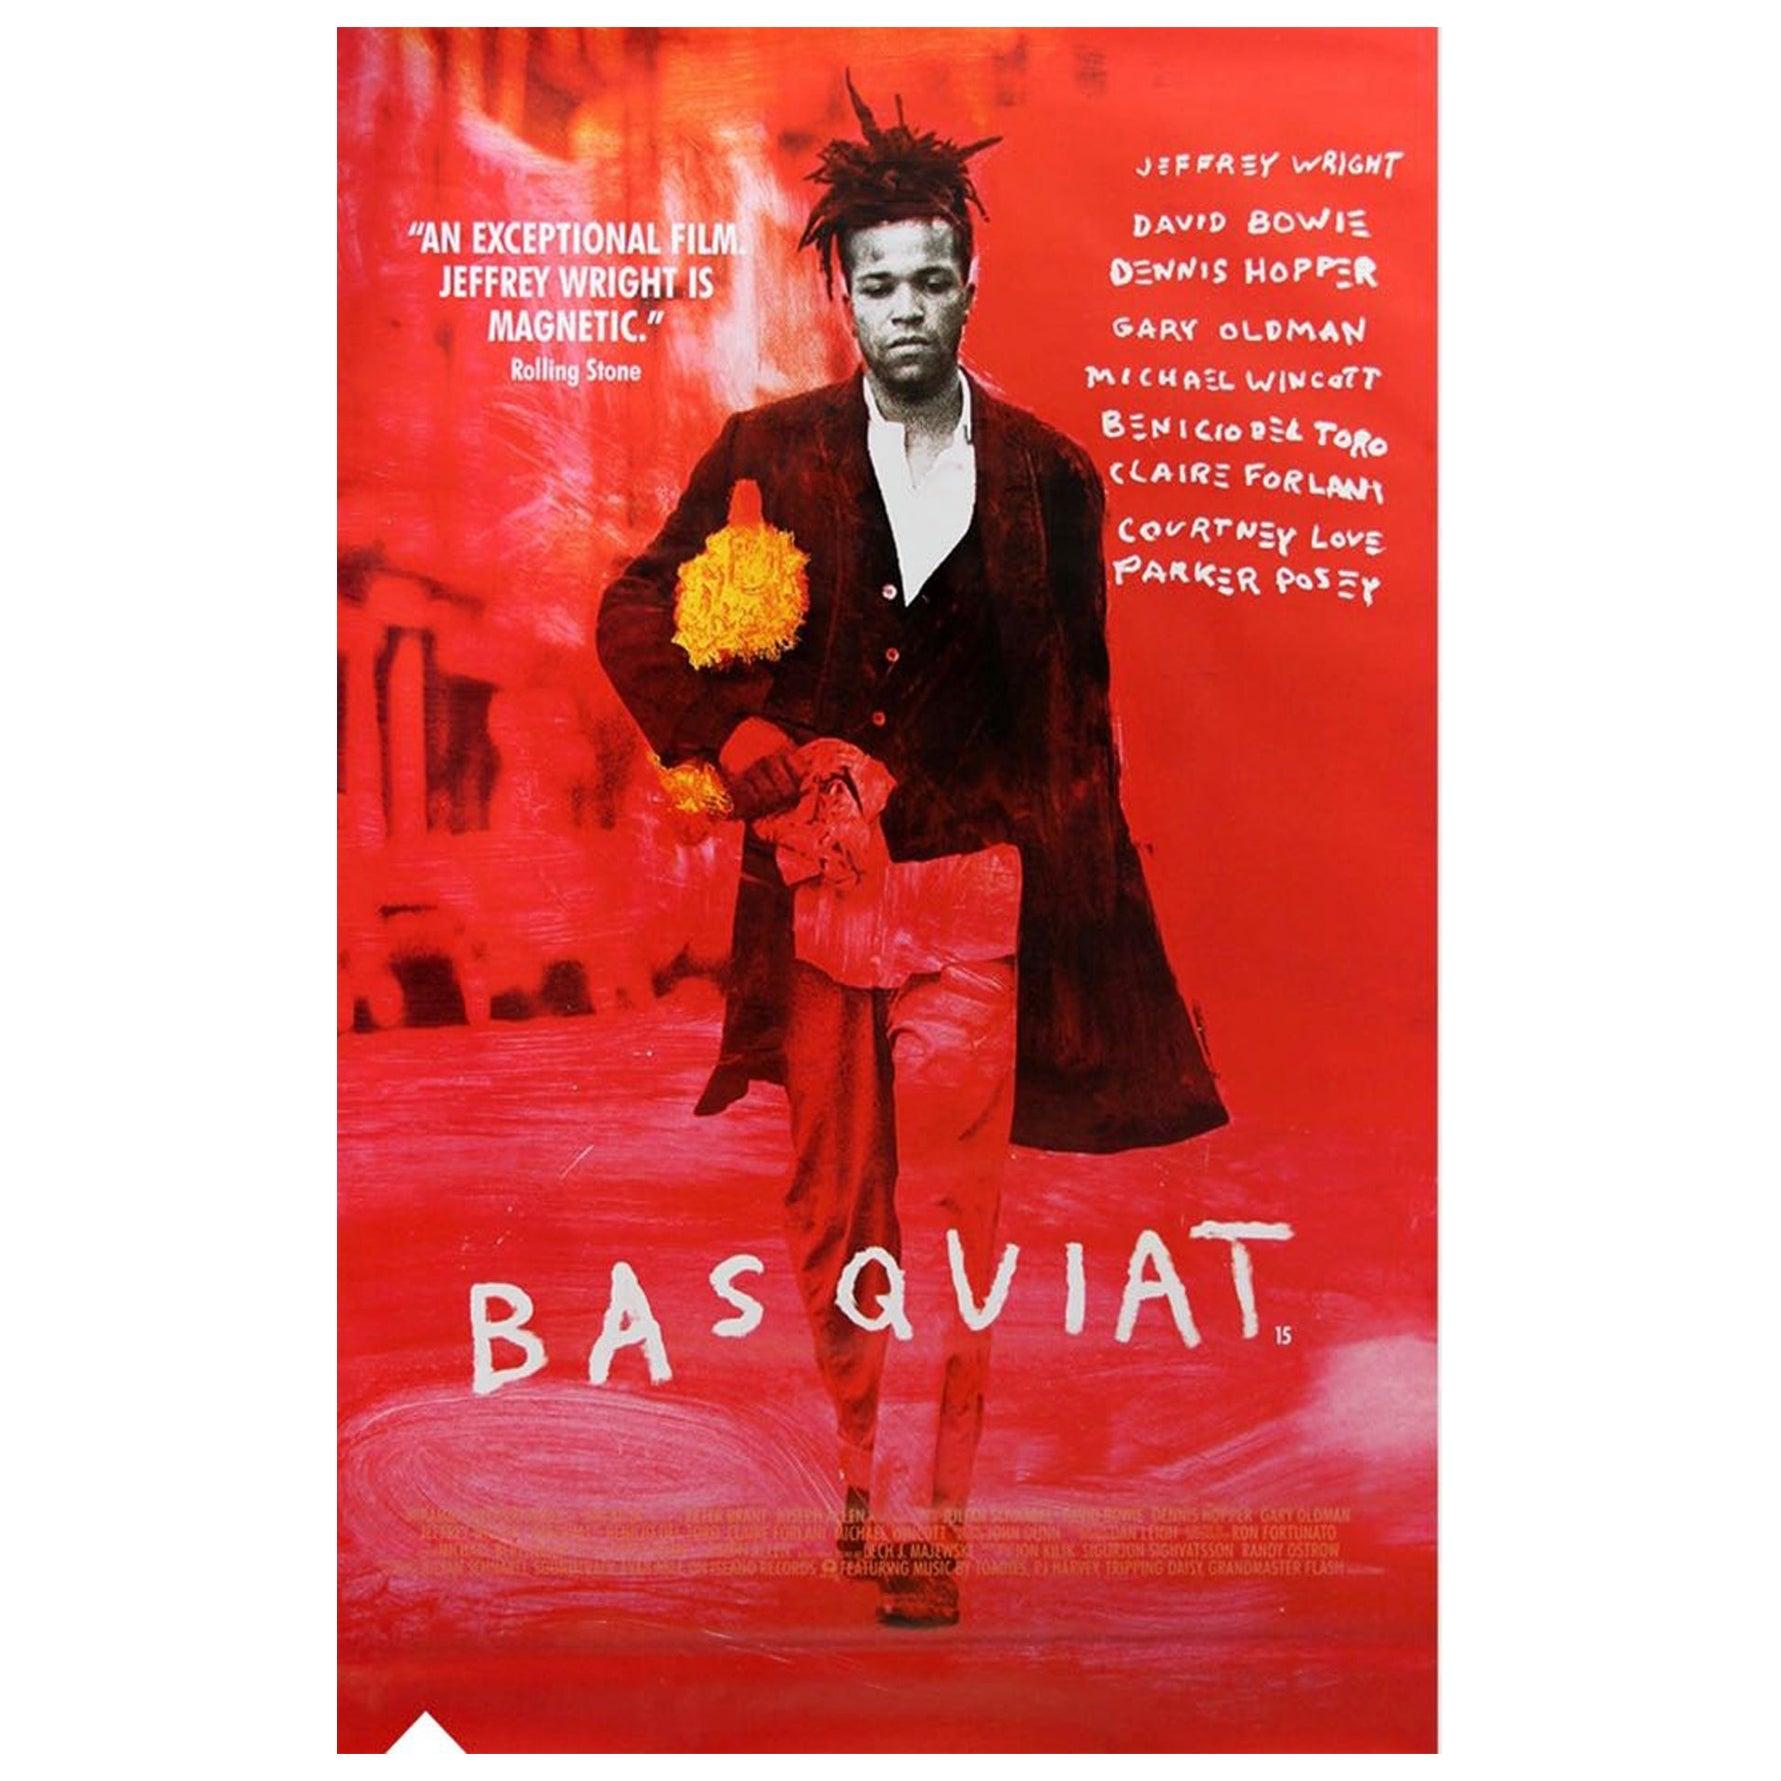 Original Adshel 'Basquiat' Movie Poster, circa 1996